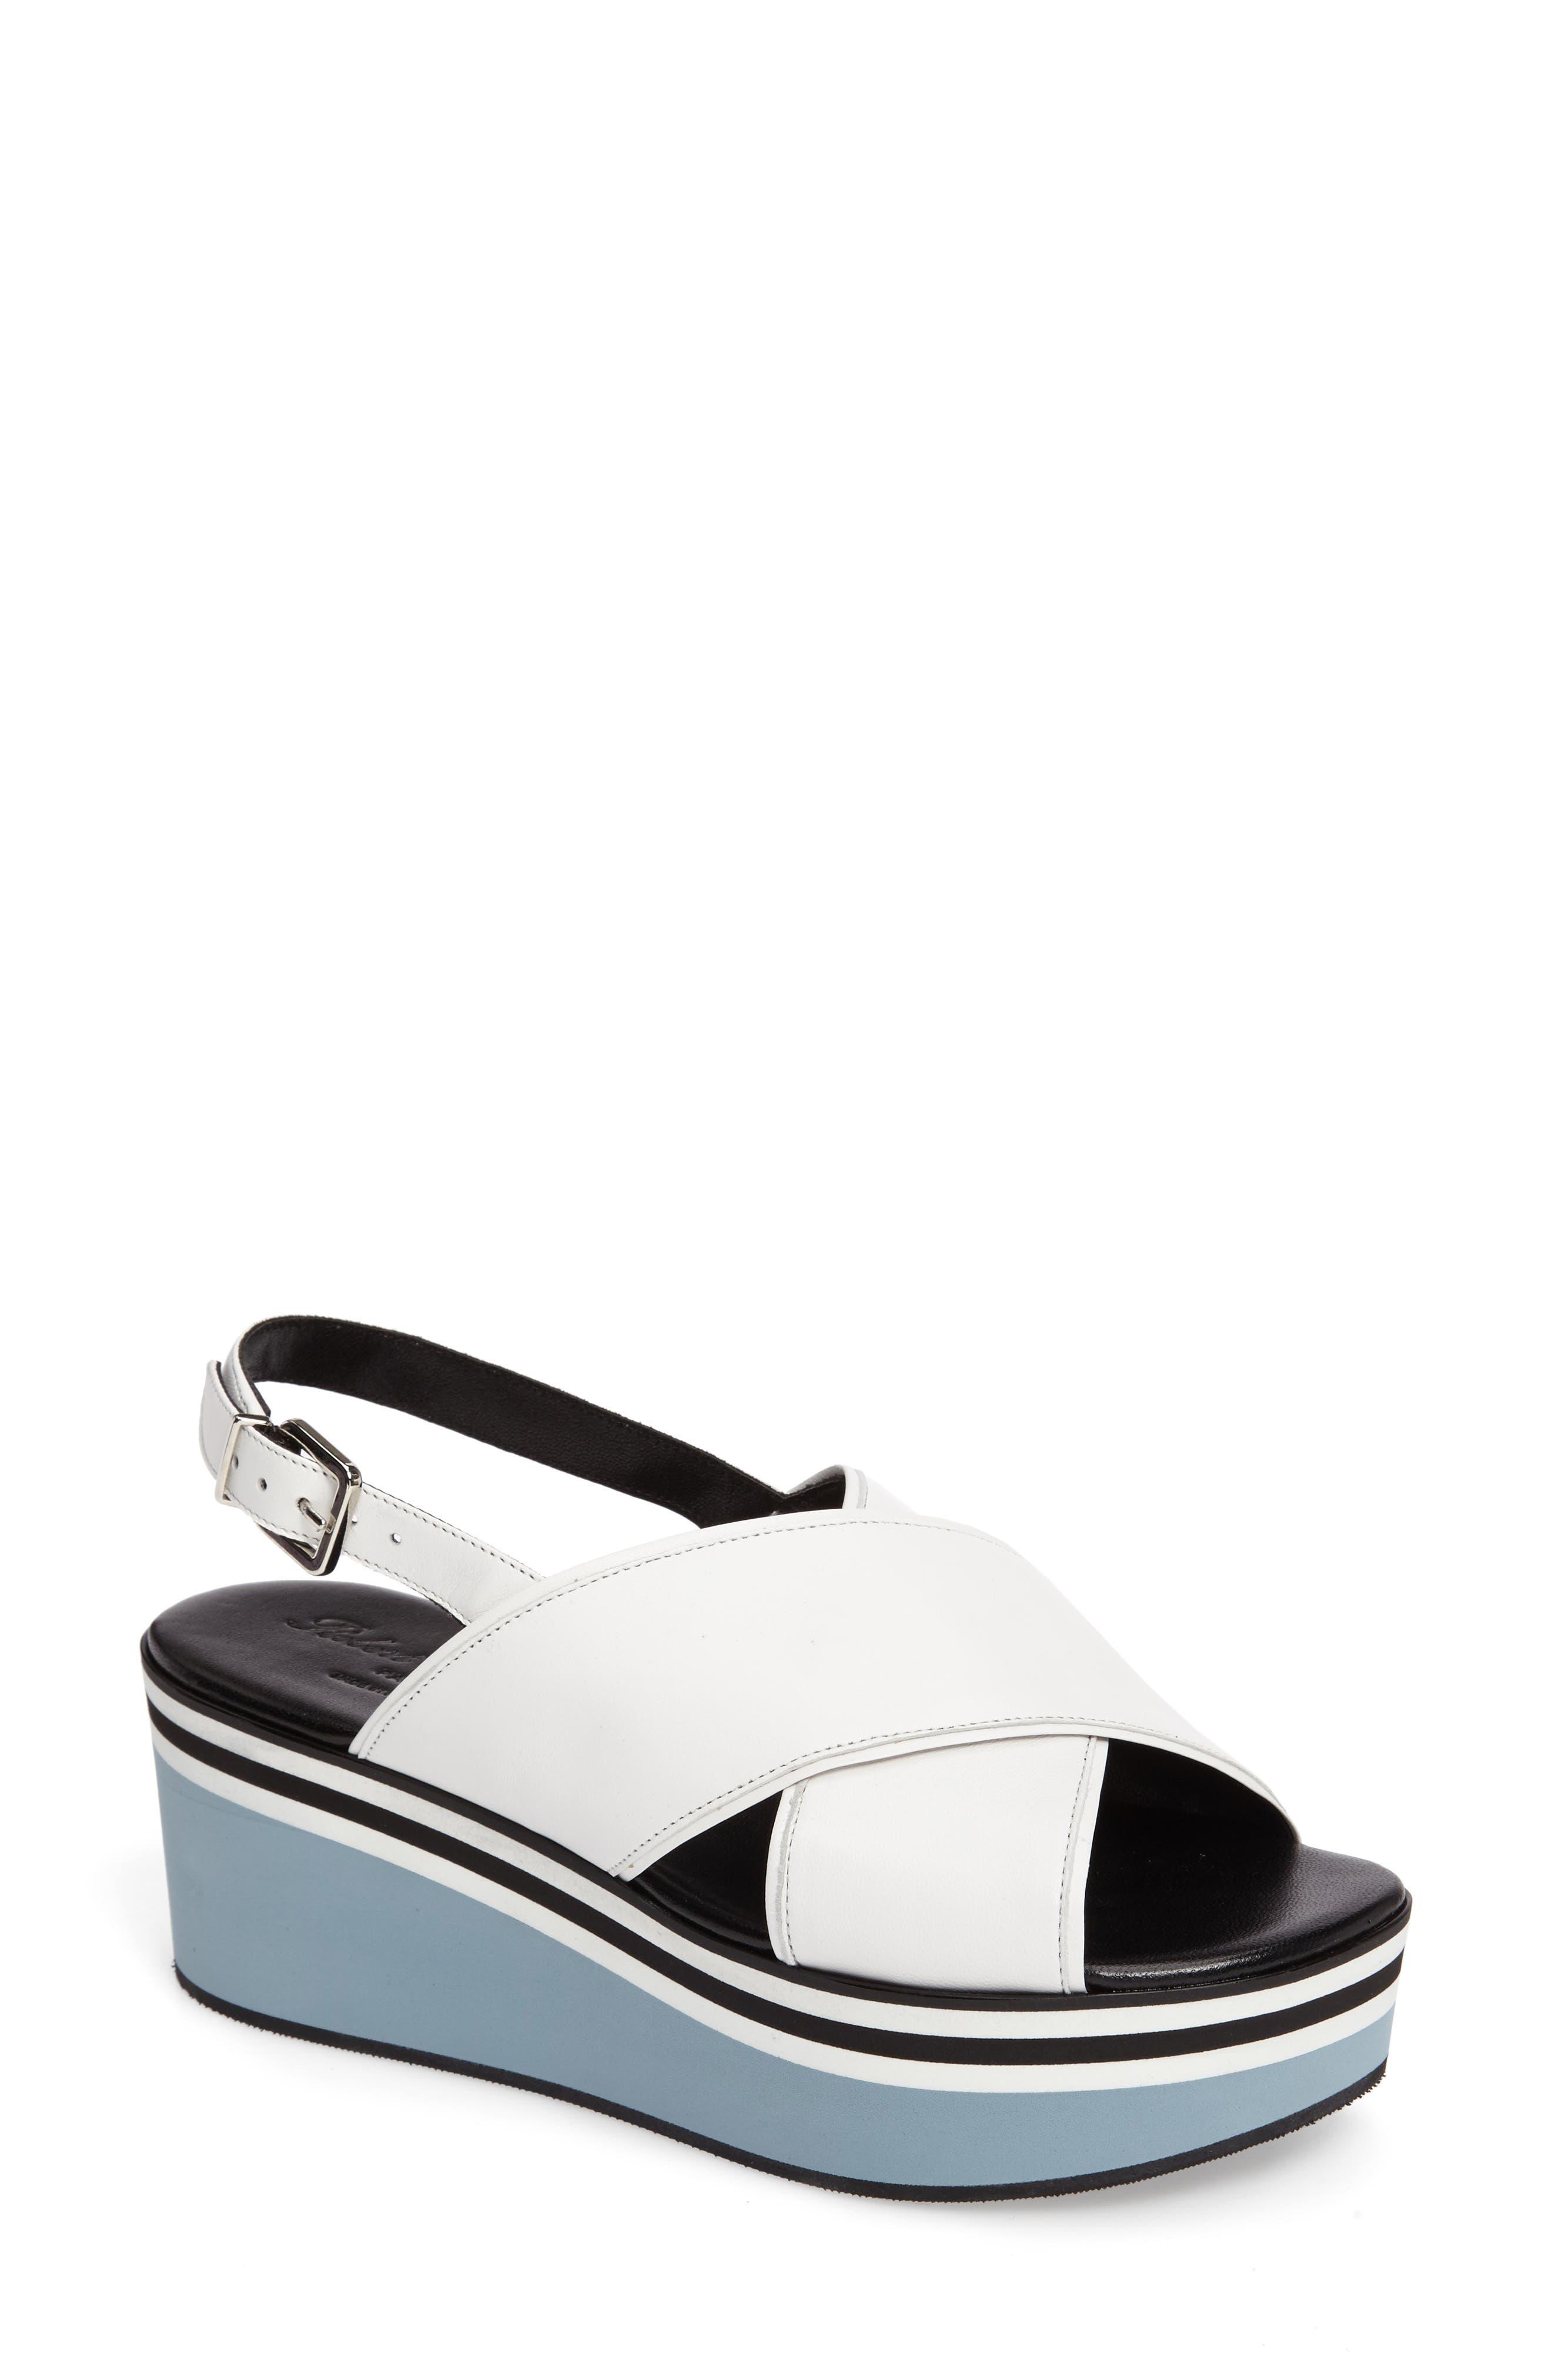 Alternate Image 1 Selected - Robert Clergerie Pupla Platform Sandal (Women)